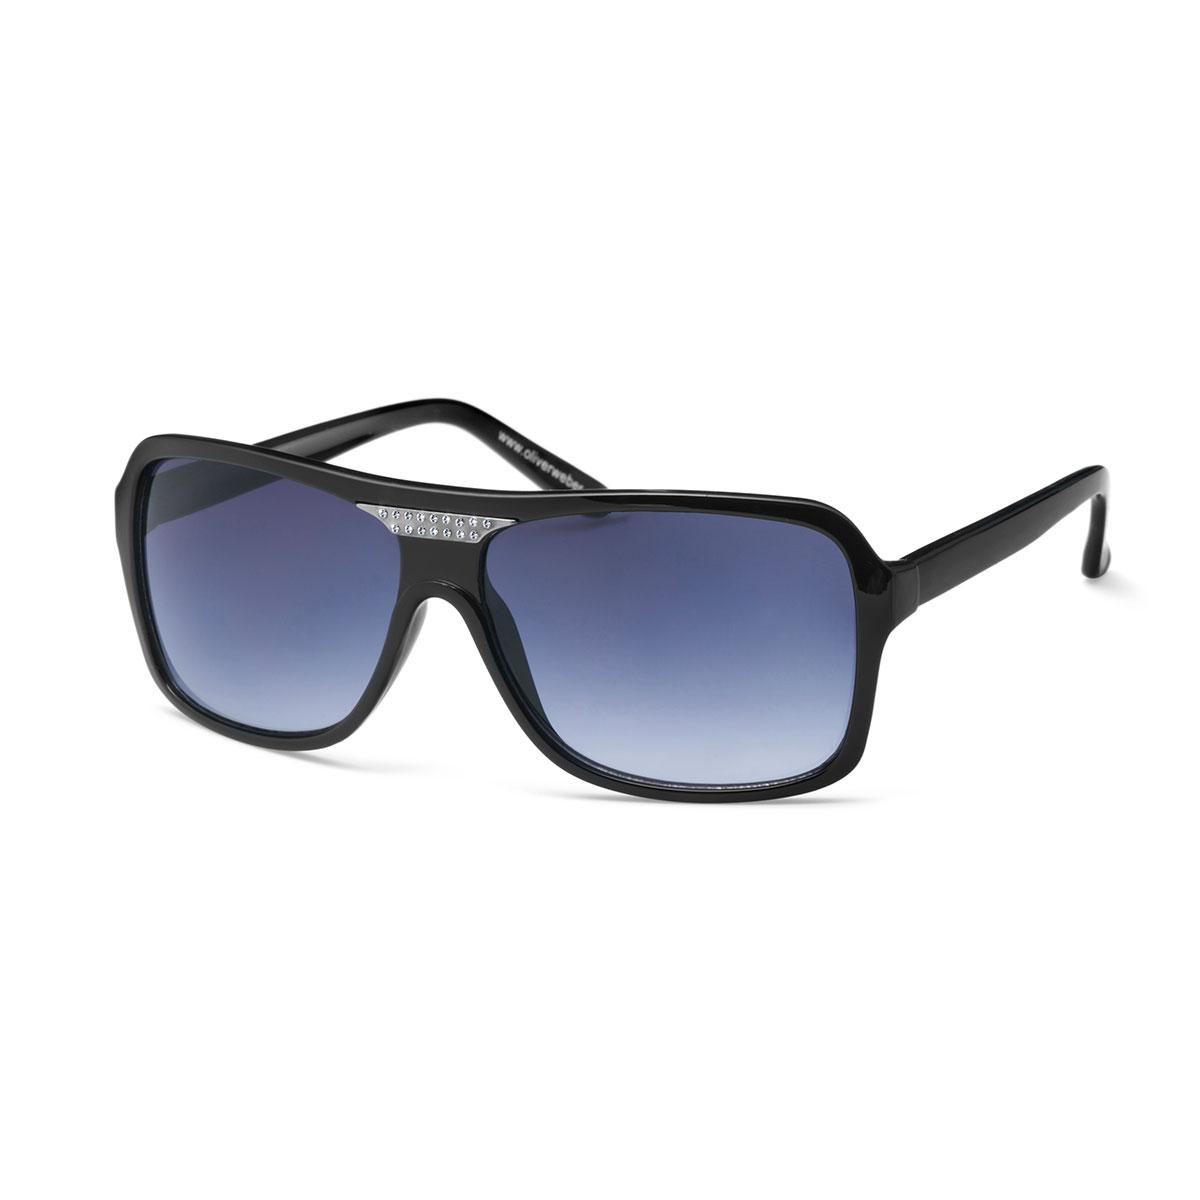 عینک آفتابی مدل کارولینای مشکی